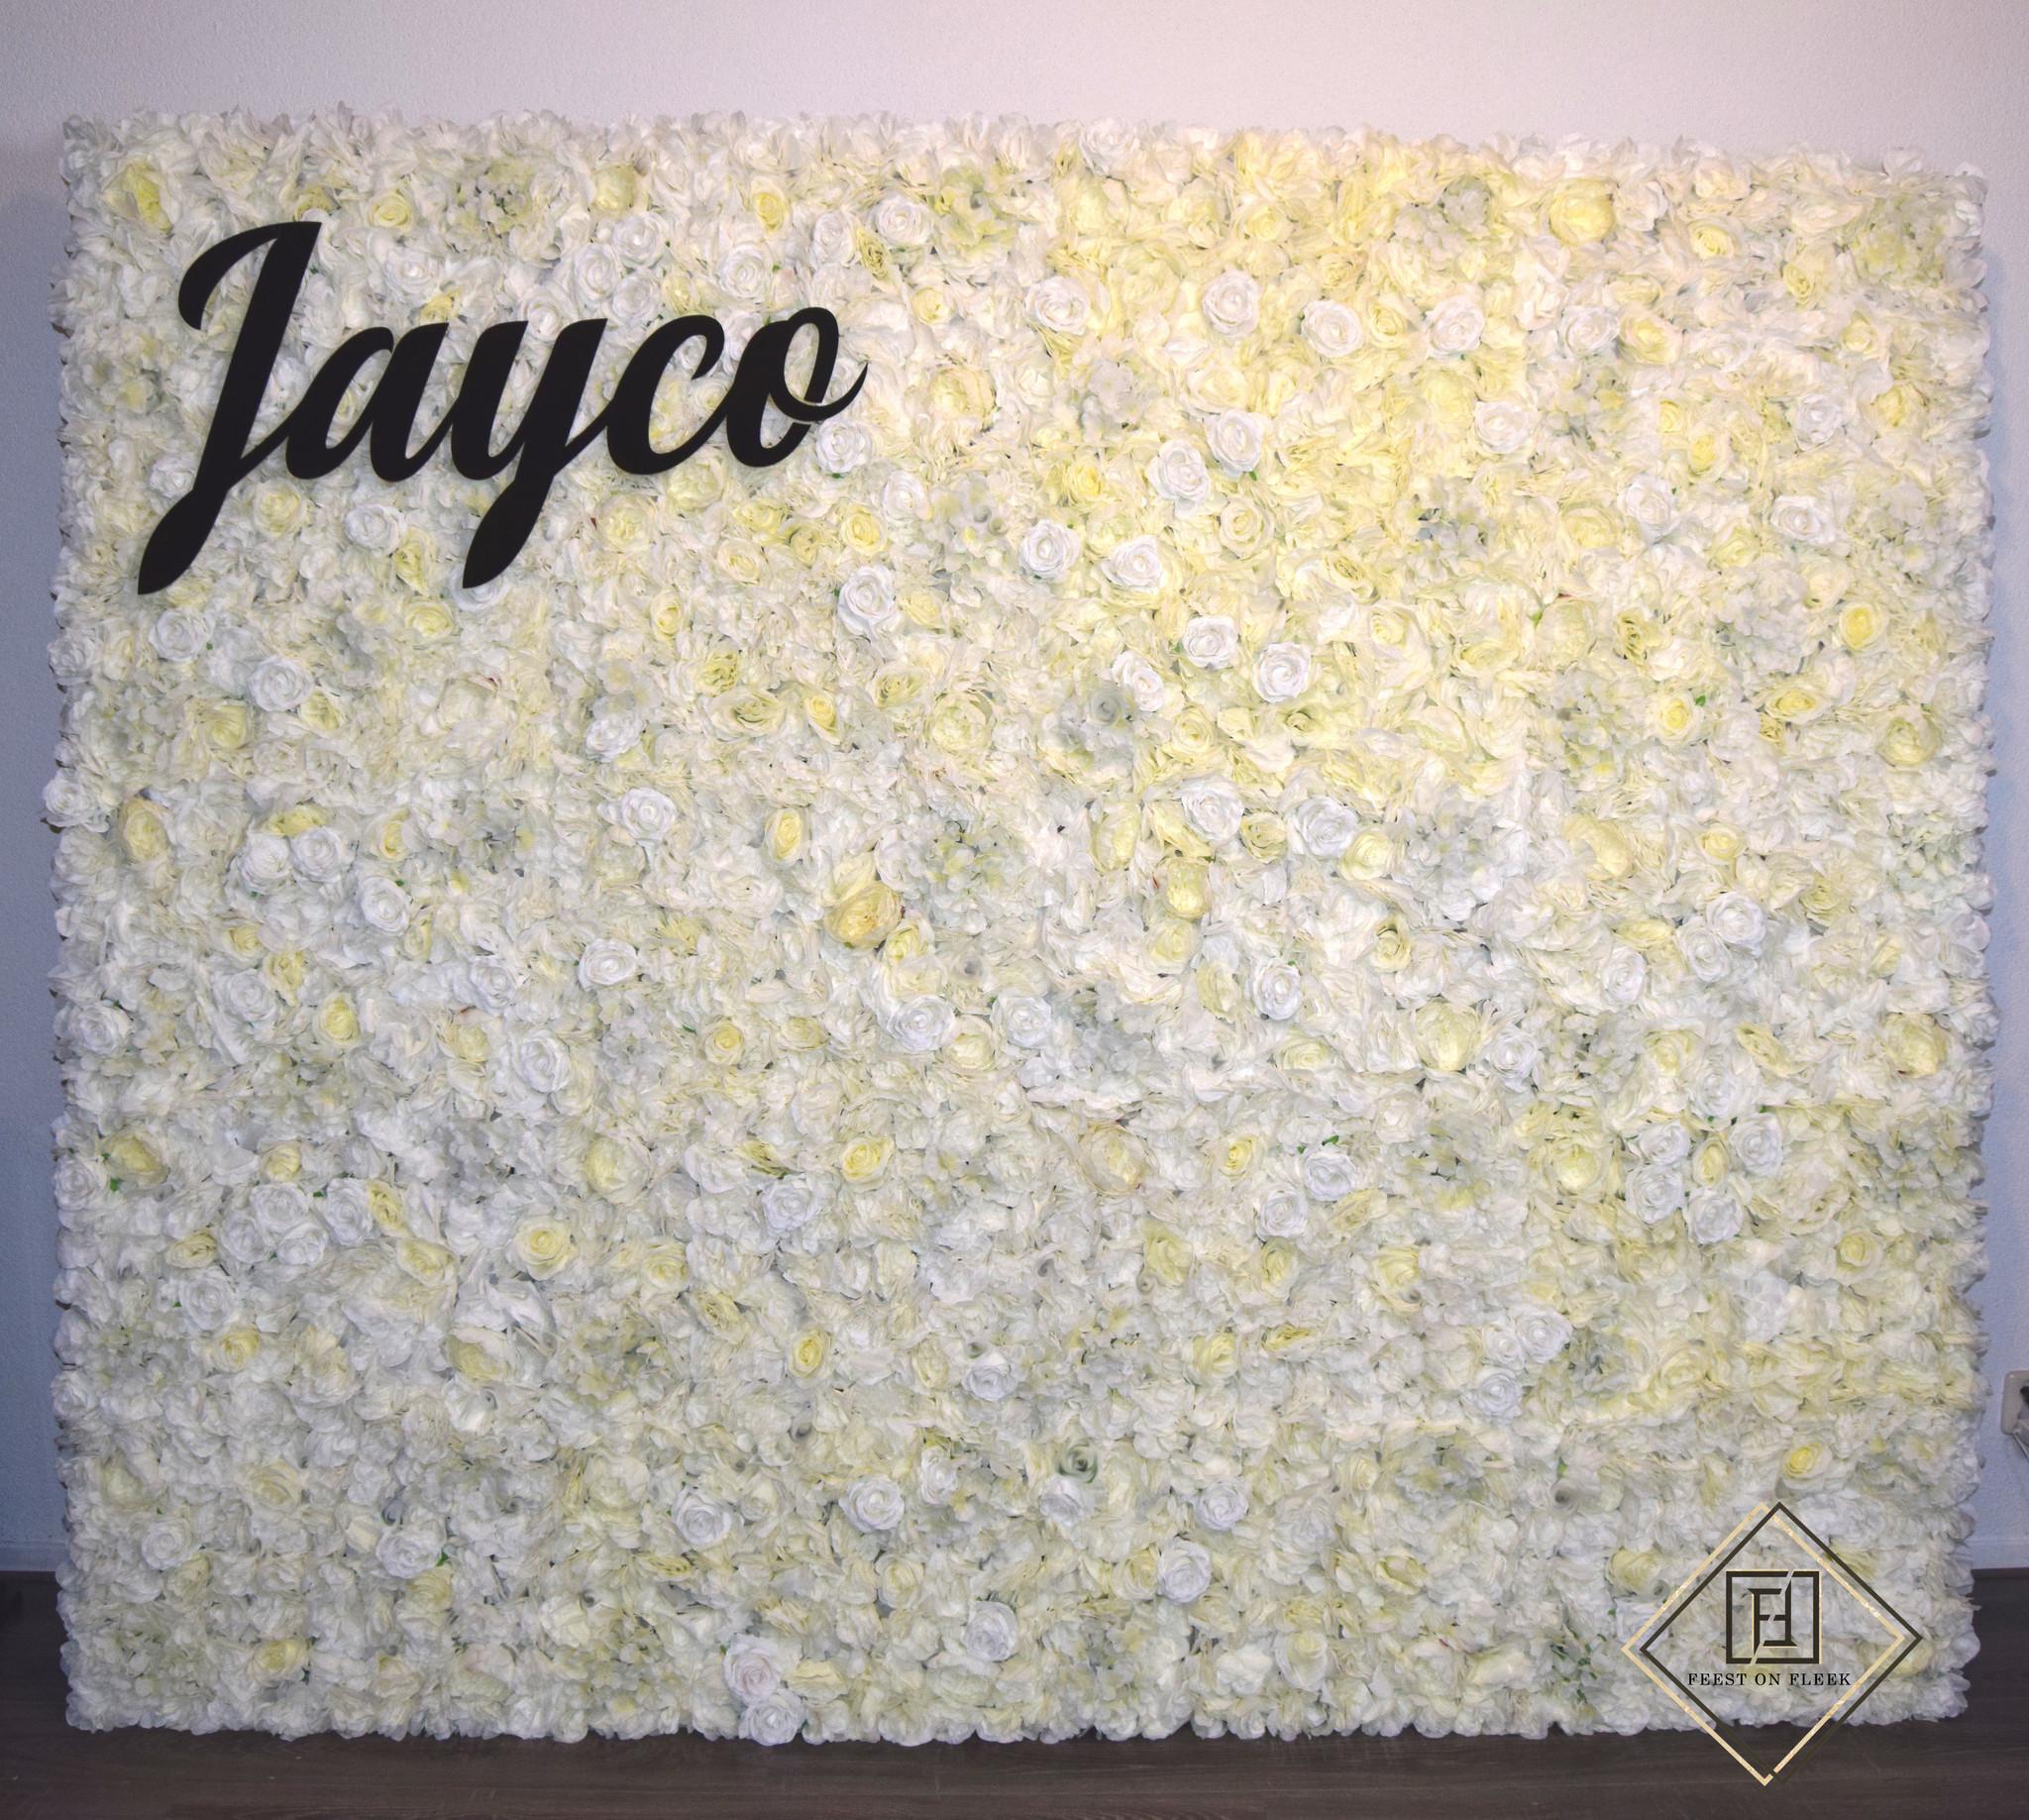 Ivory Flower Wall 240 x 200 (TE HUUR)